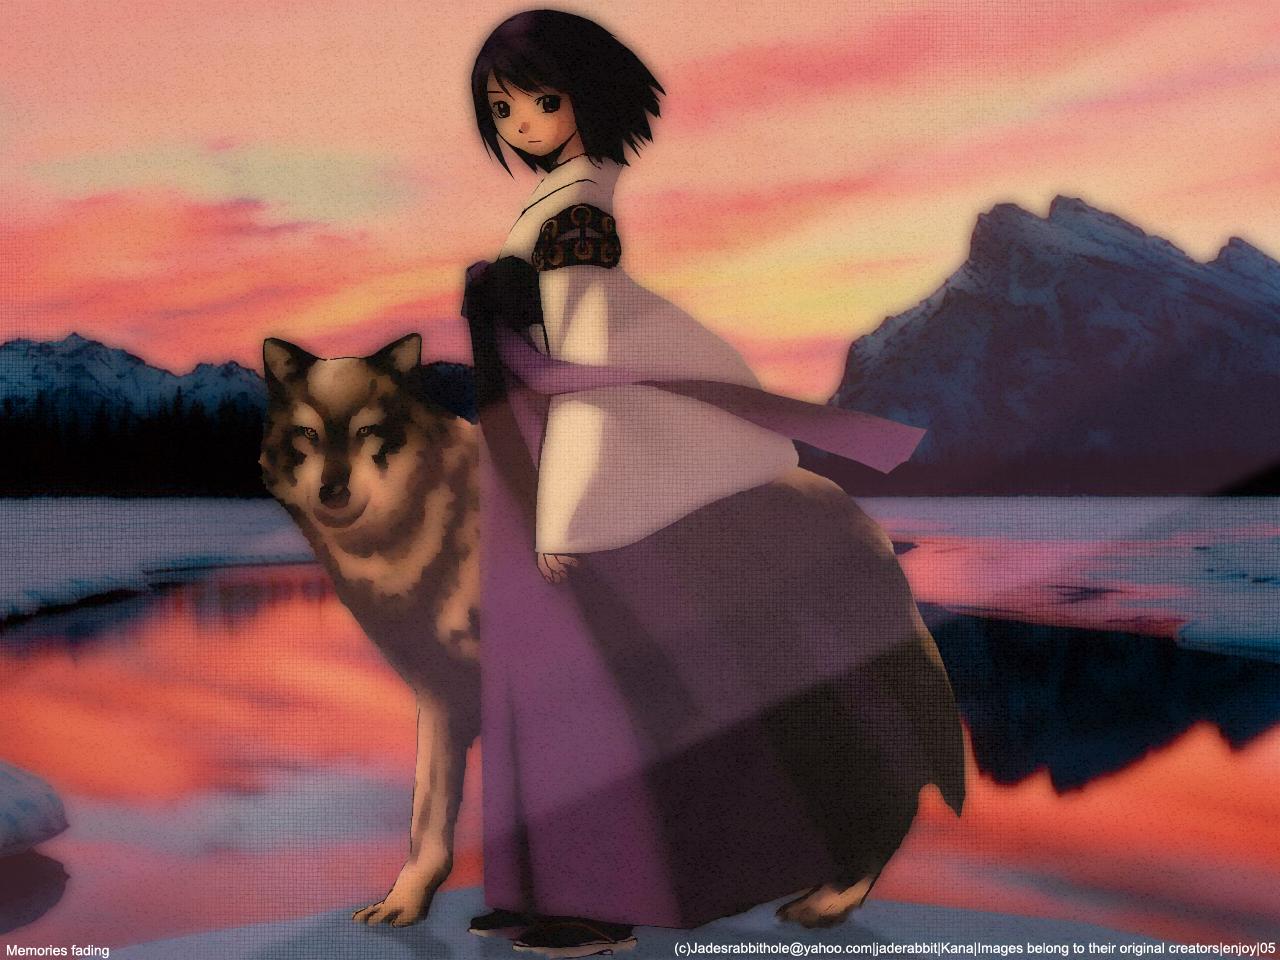 Anime Wallpaper Memories Fading Minitokyo